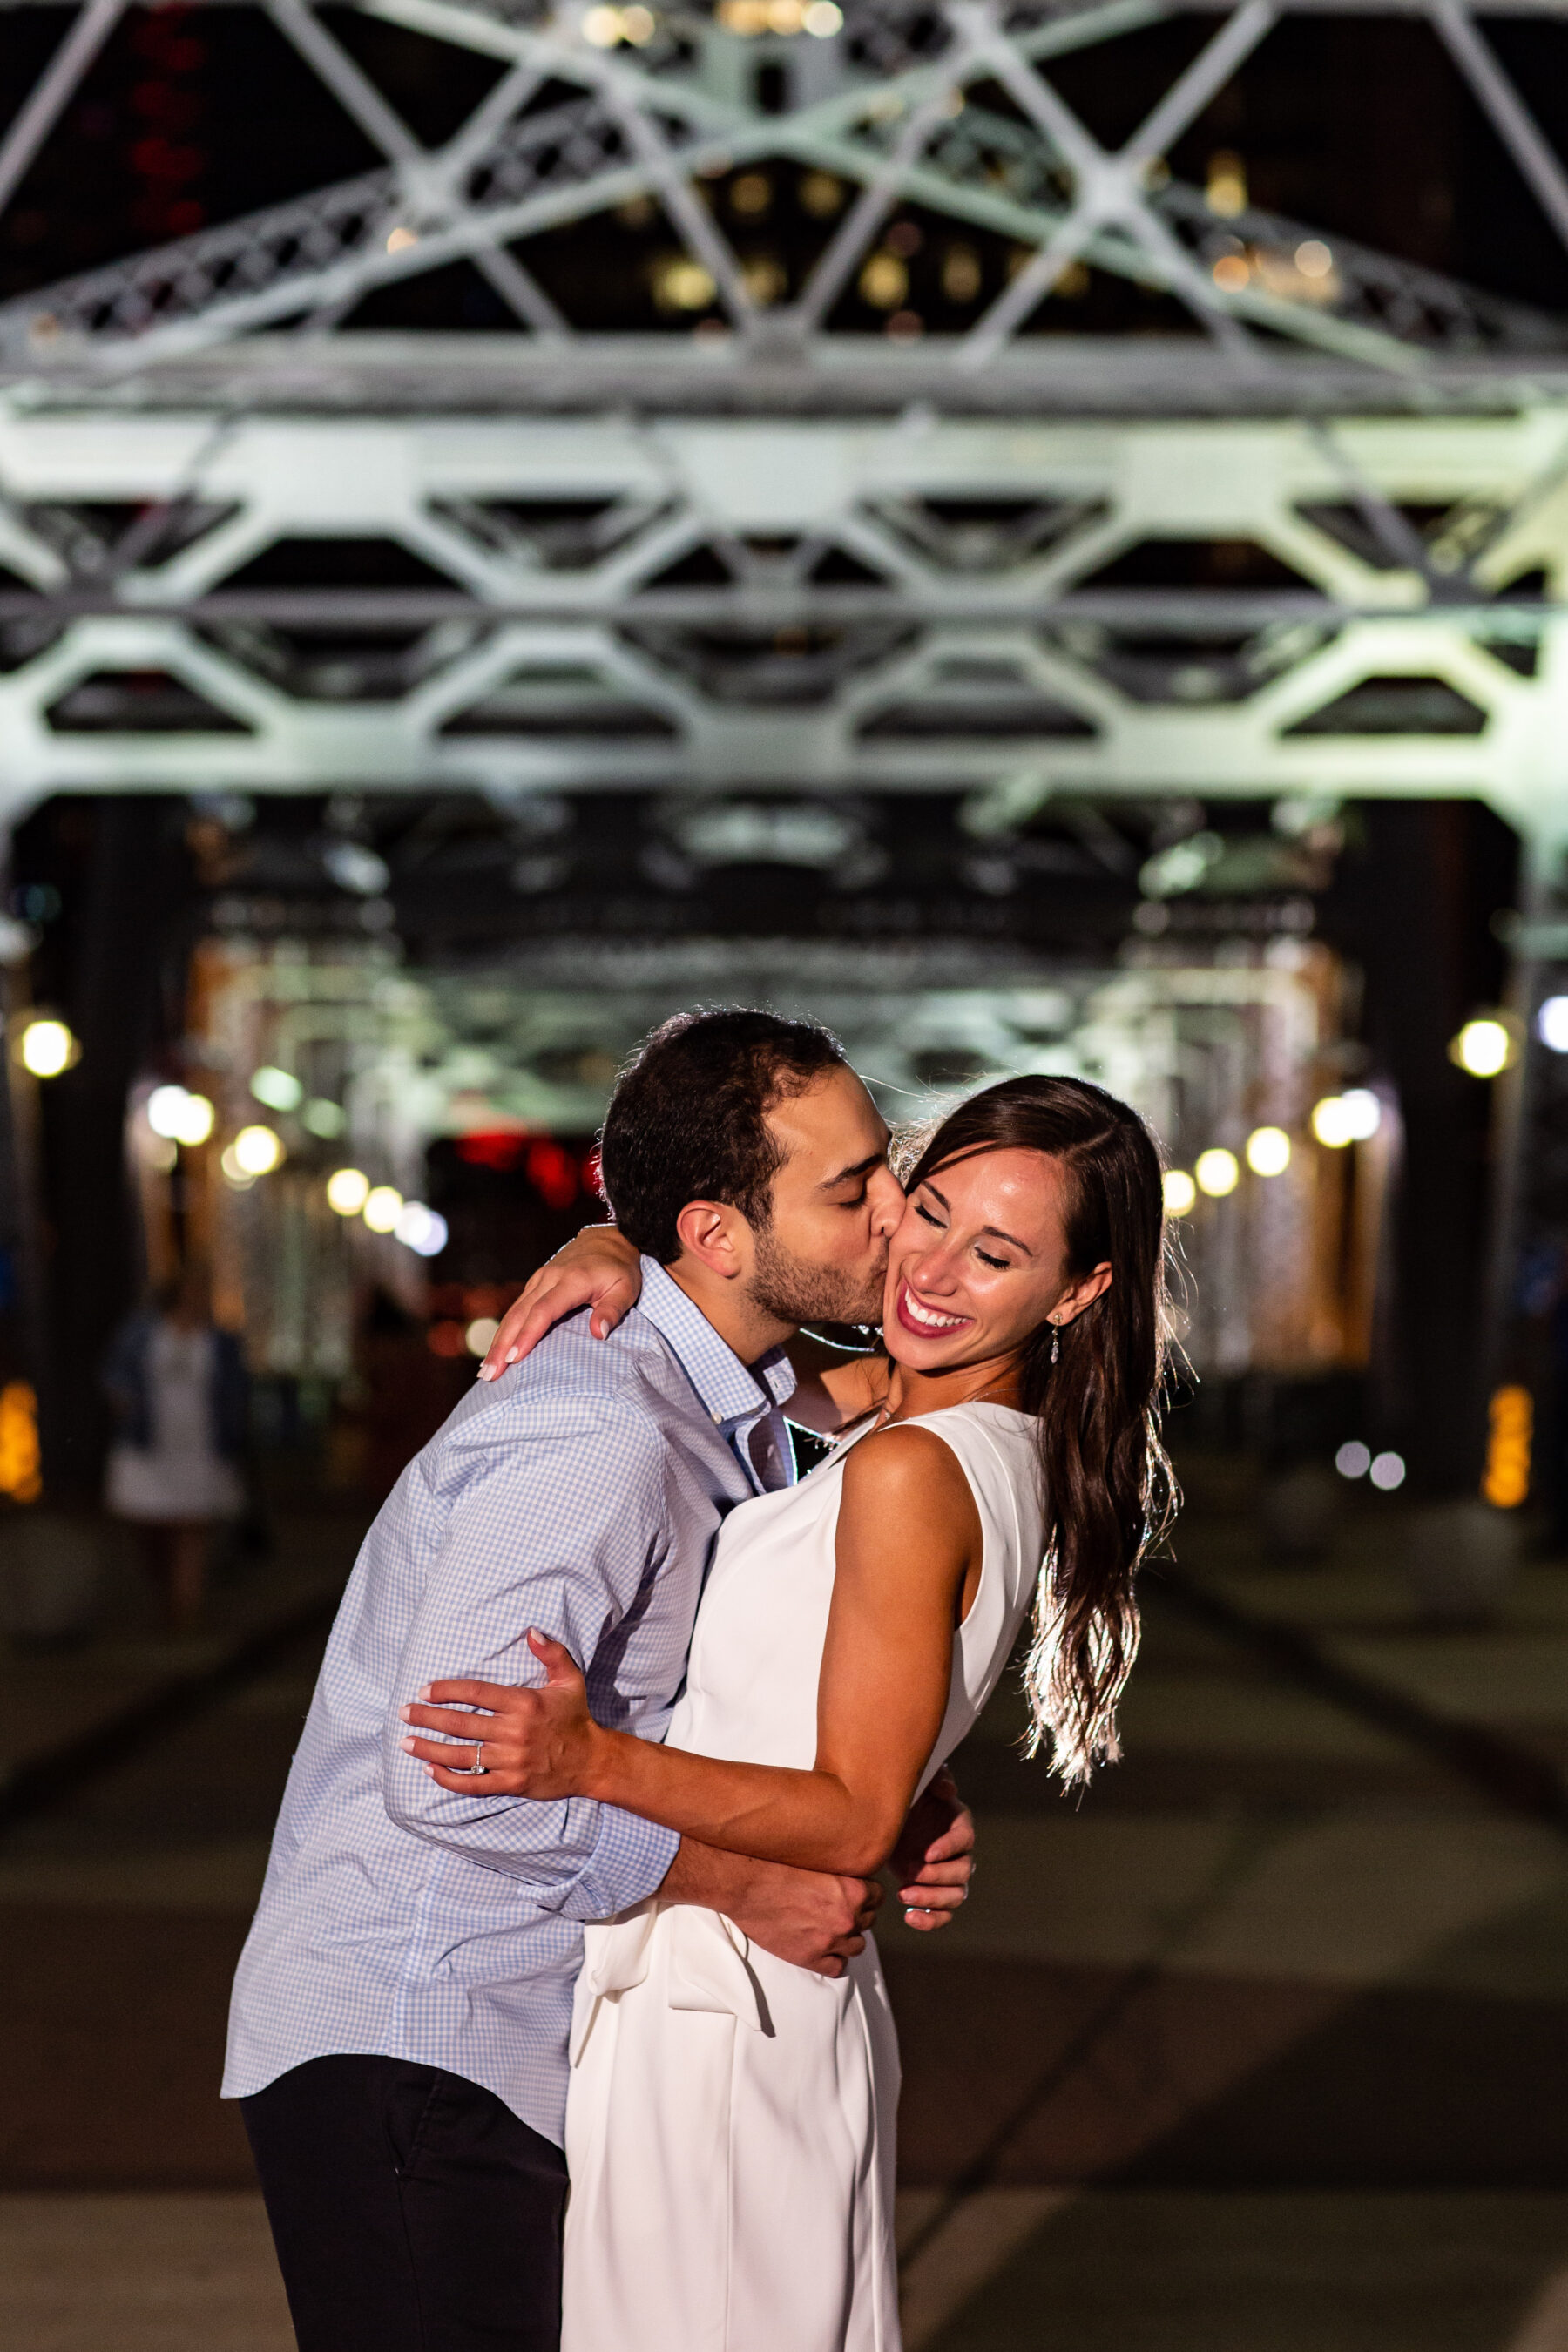 Erica of Bride Brite's Fun Nashville Engagement Session | Nashville Bride Guide